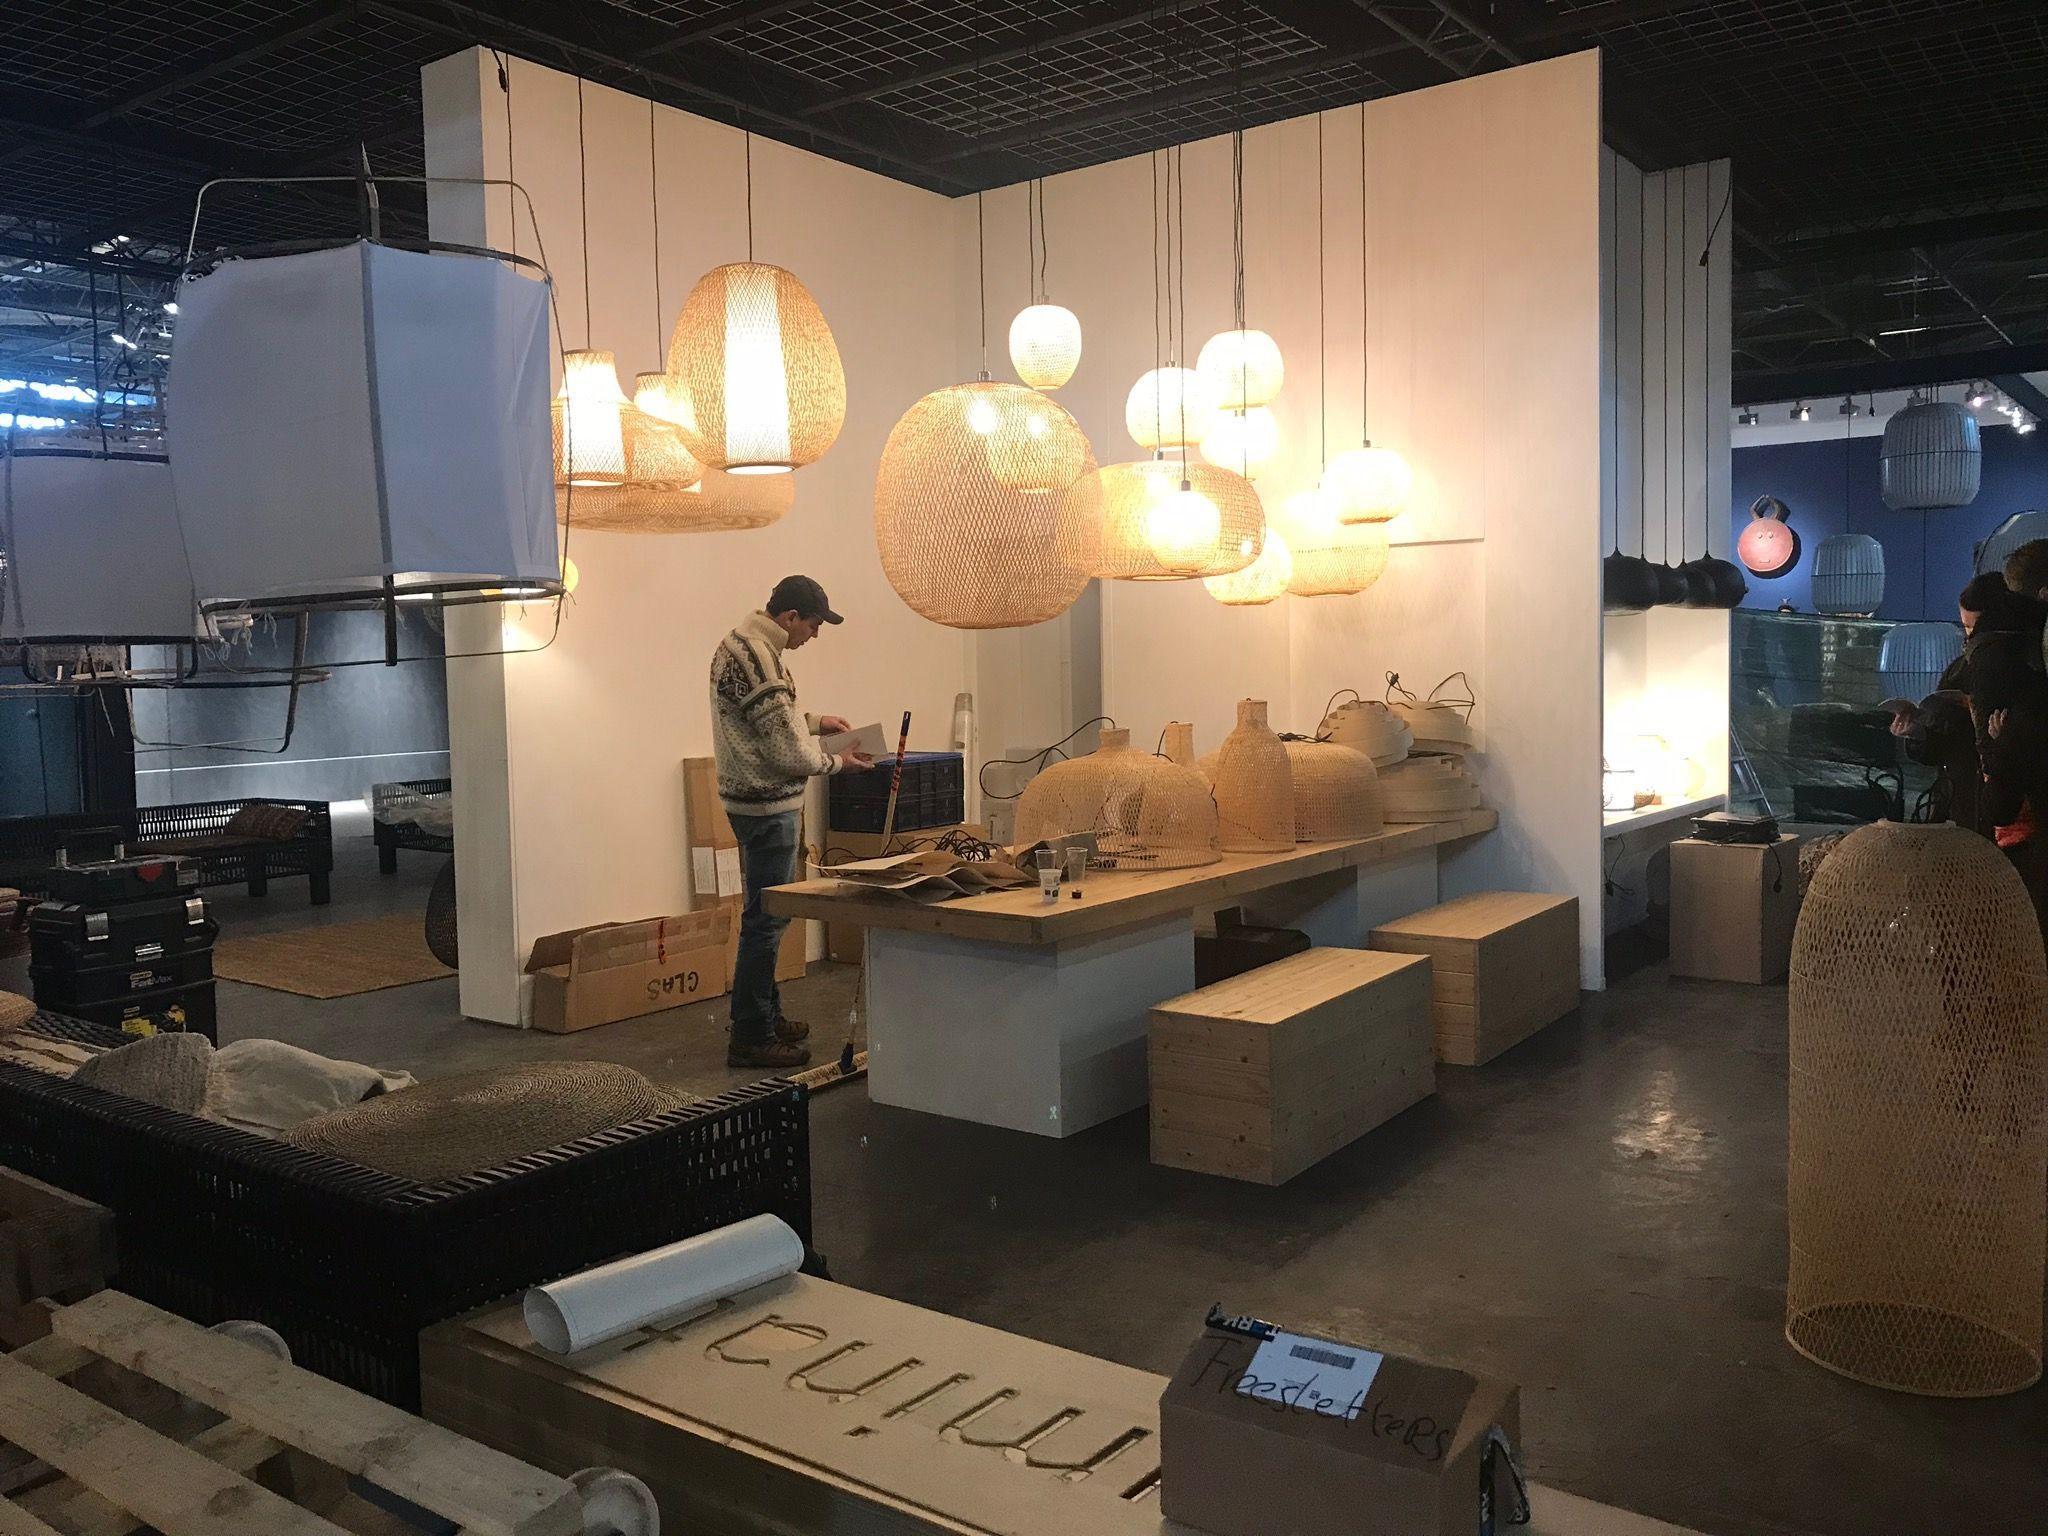 Interior Design Trends Presented At Maison Objet 2019